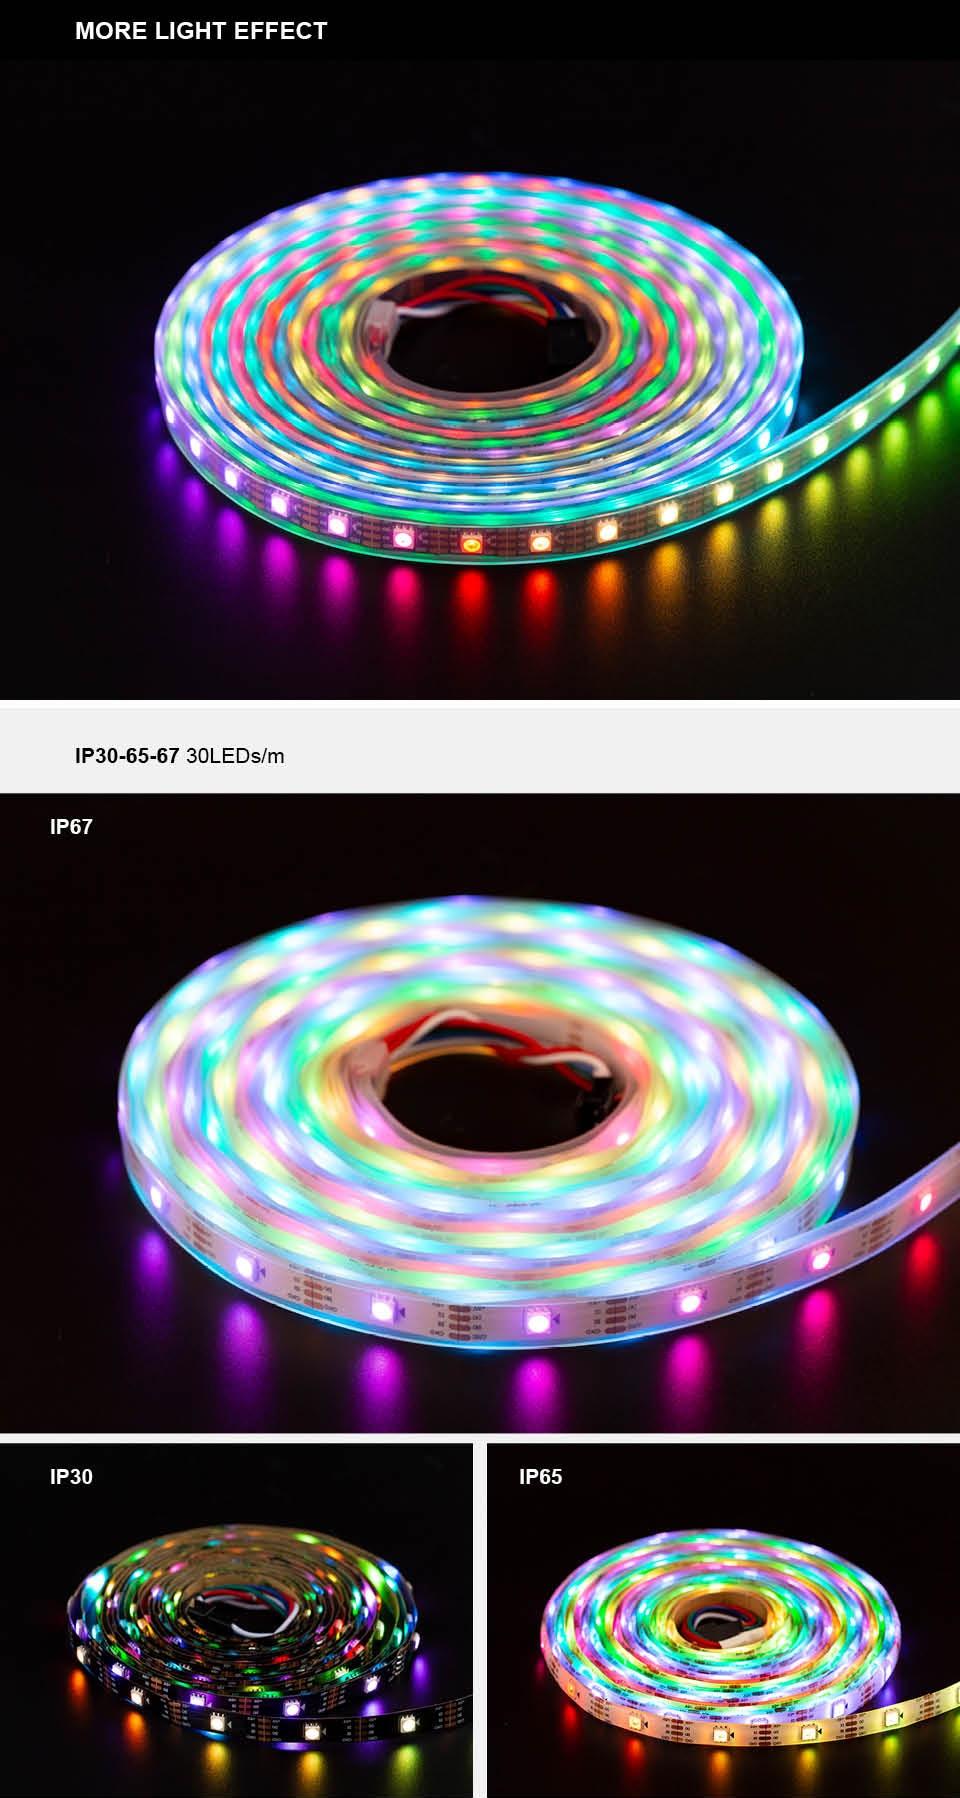 HTB1zUP6acnrK1RjSspkq6yuvXXaF WS2815 DC12V (WS2812B/WS2813) RGB LED Pixels Strip Light Individually Addressable LED Dual-Signal 1m/5m 30/60/144 Pixels/Leds/m